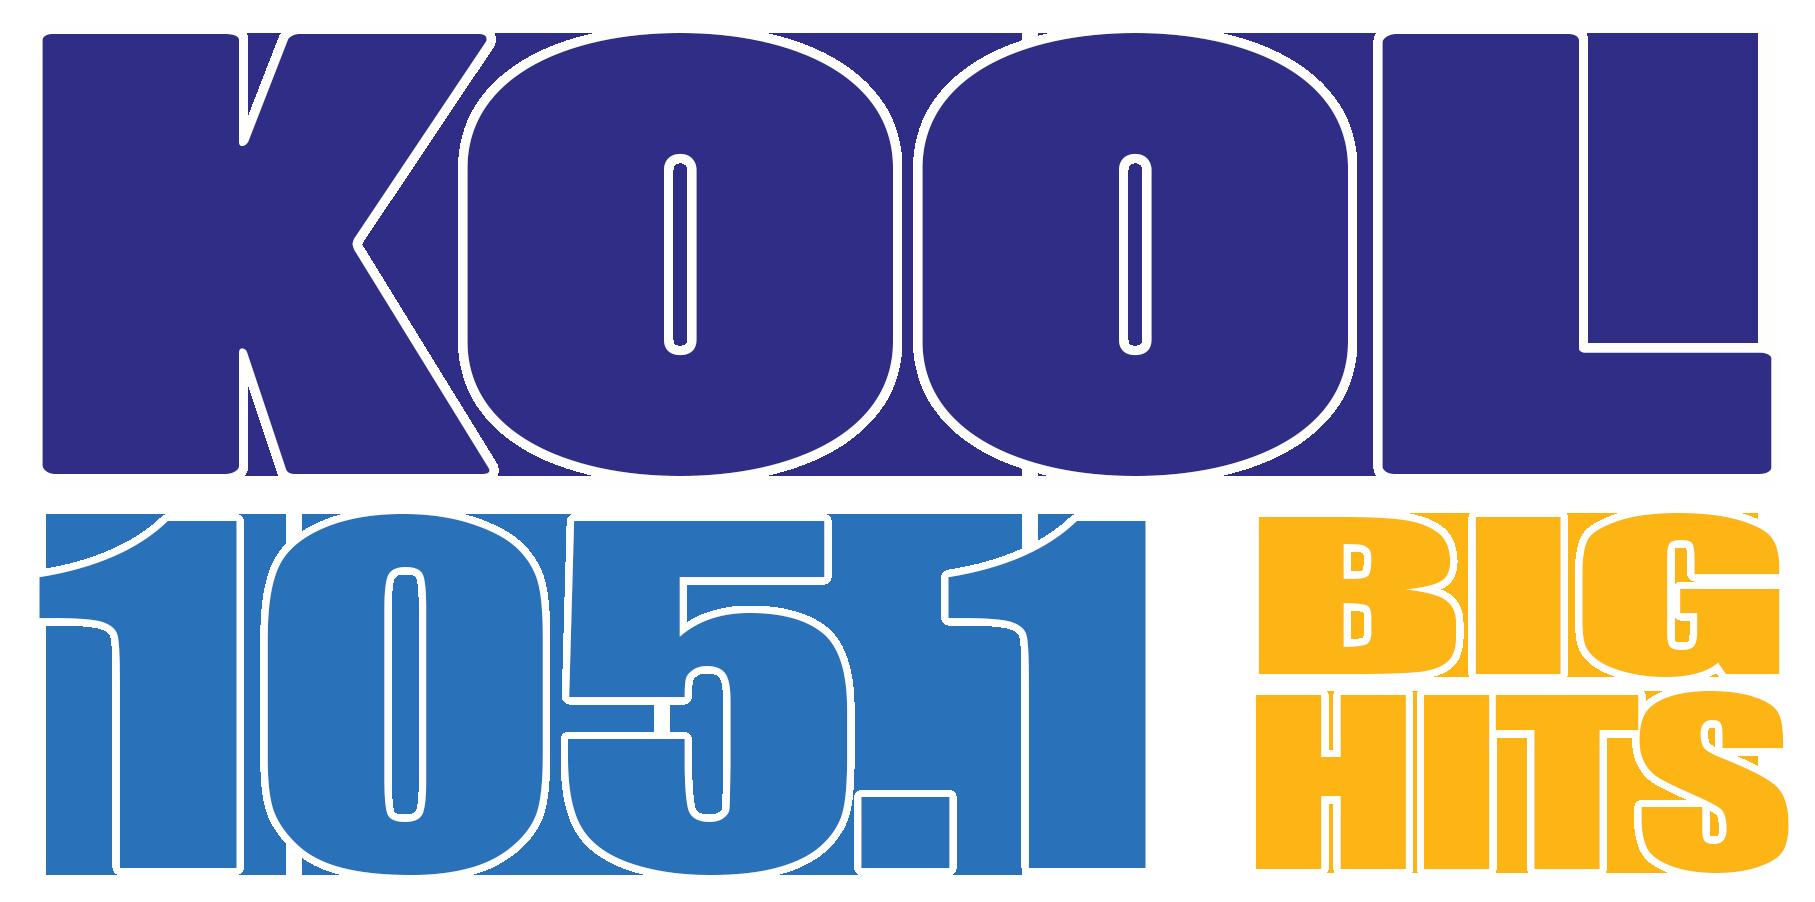 KOOL bighits logo_w outlines